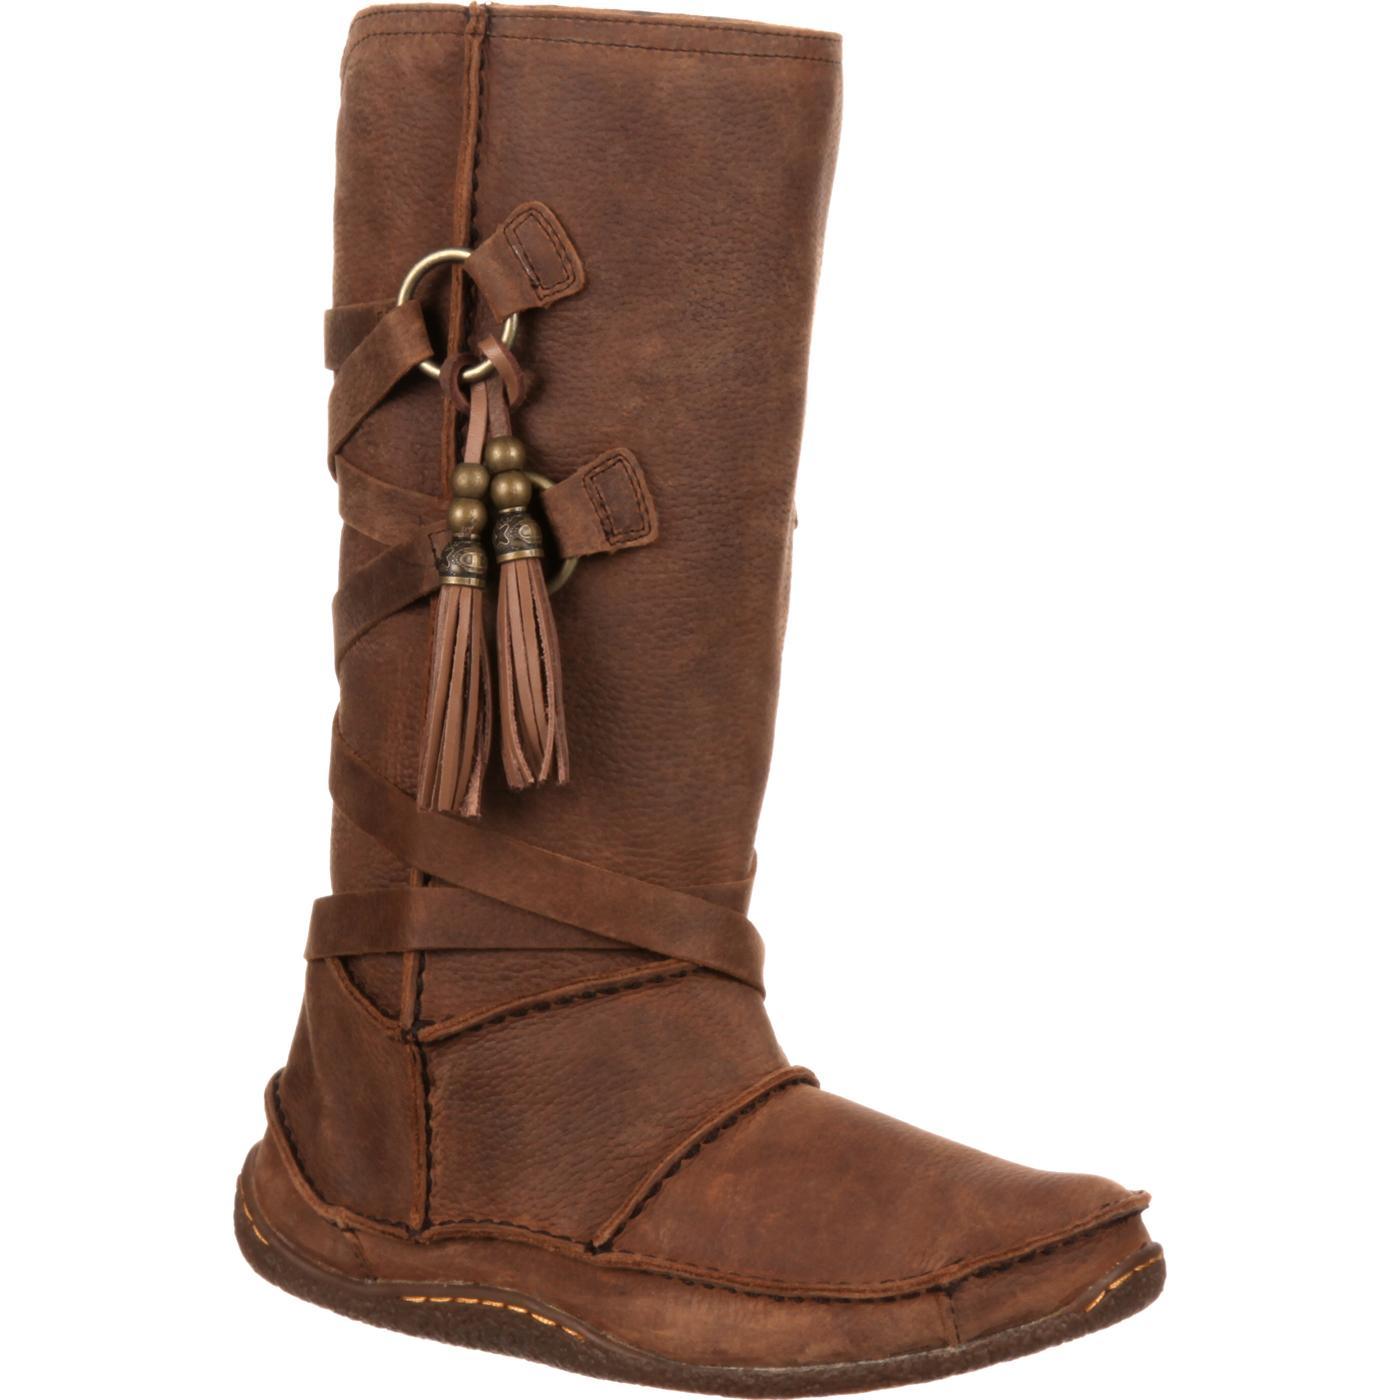 moccasin boots durango city womenu0027s santa fe tassel moccasin, , large xephkom